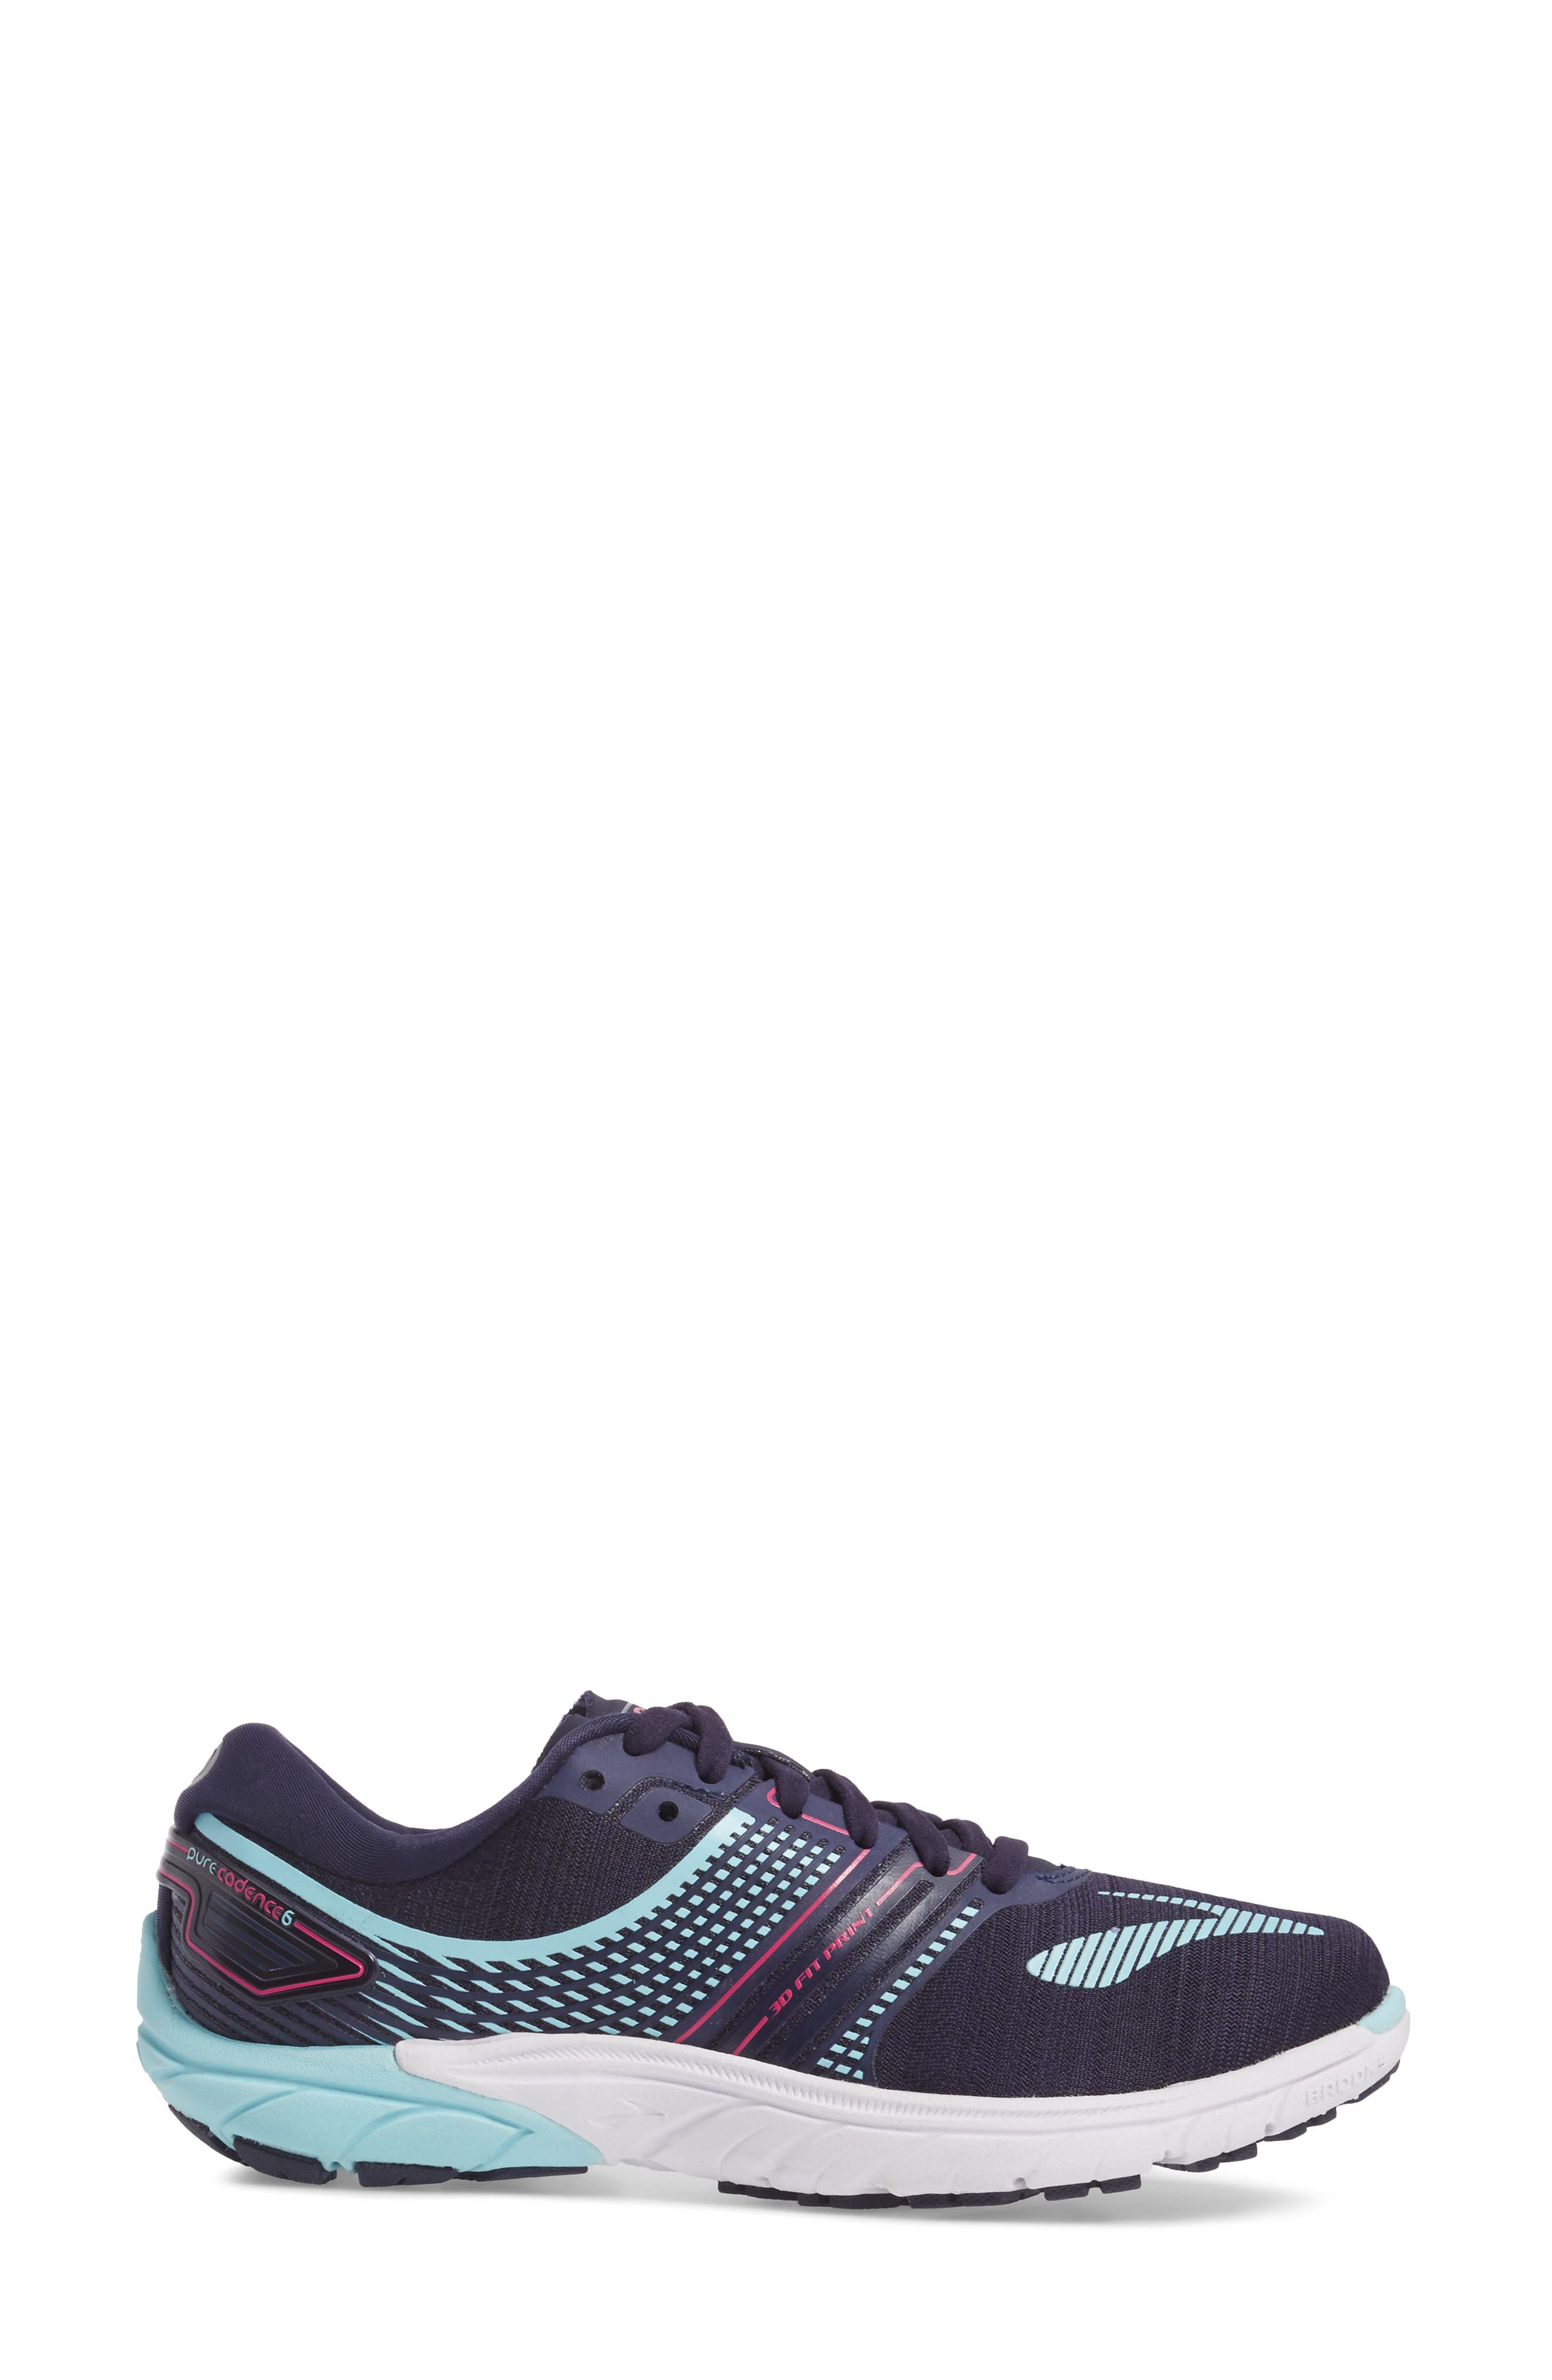 PureCadence 6 Running Shoe,                             Alternate thumbnail 3, color,                             435